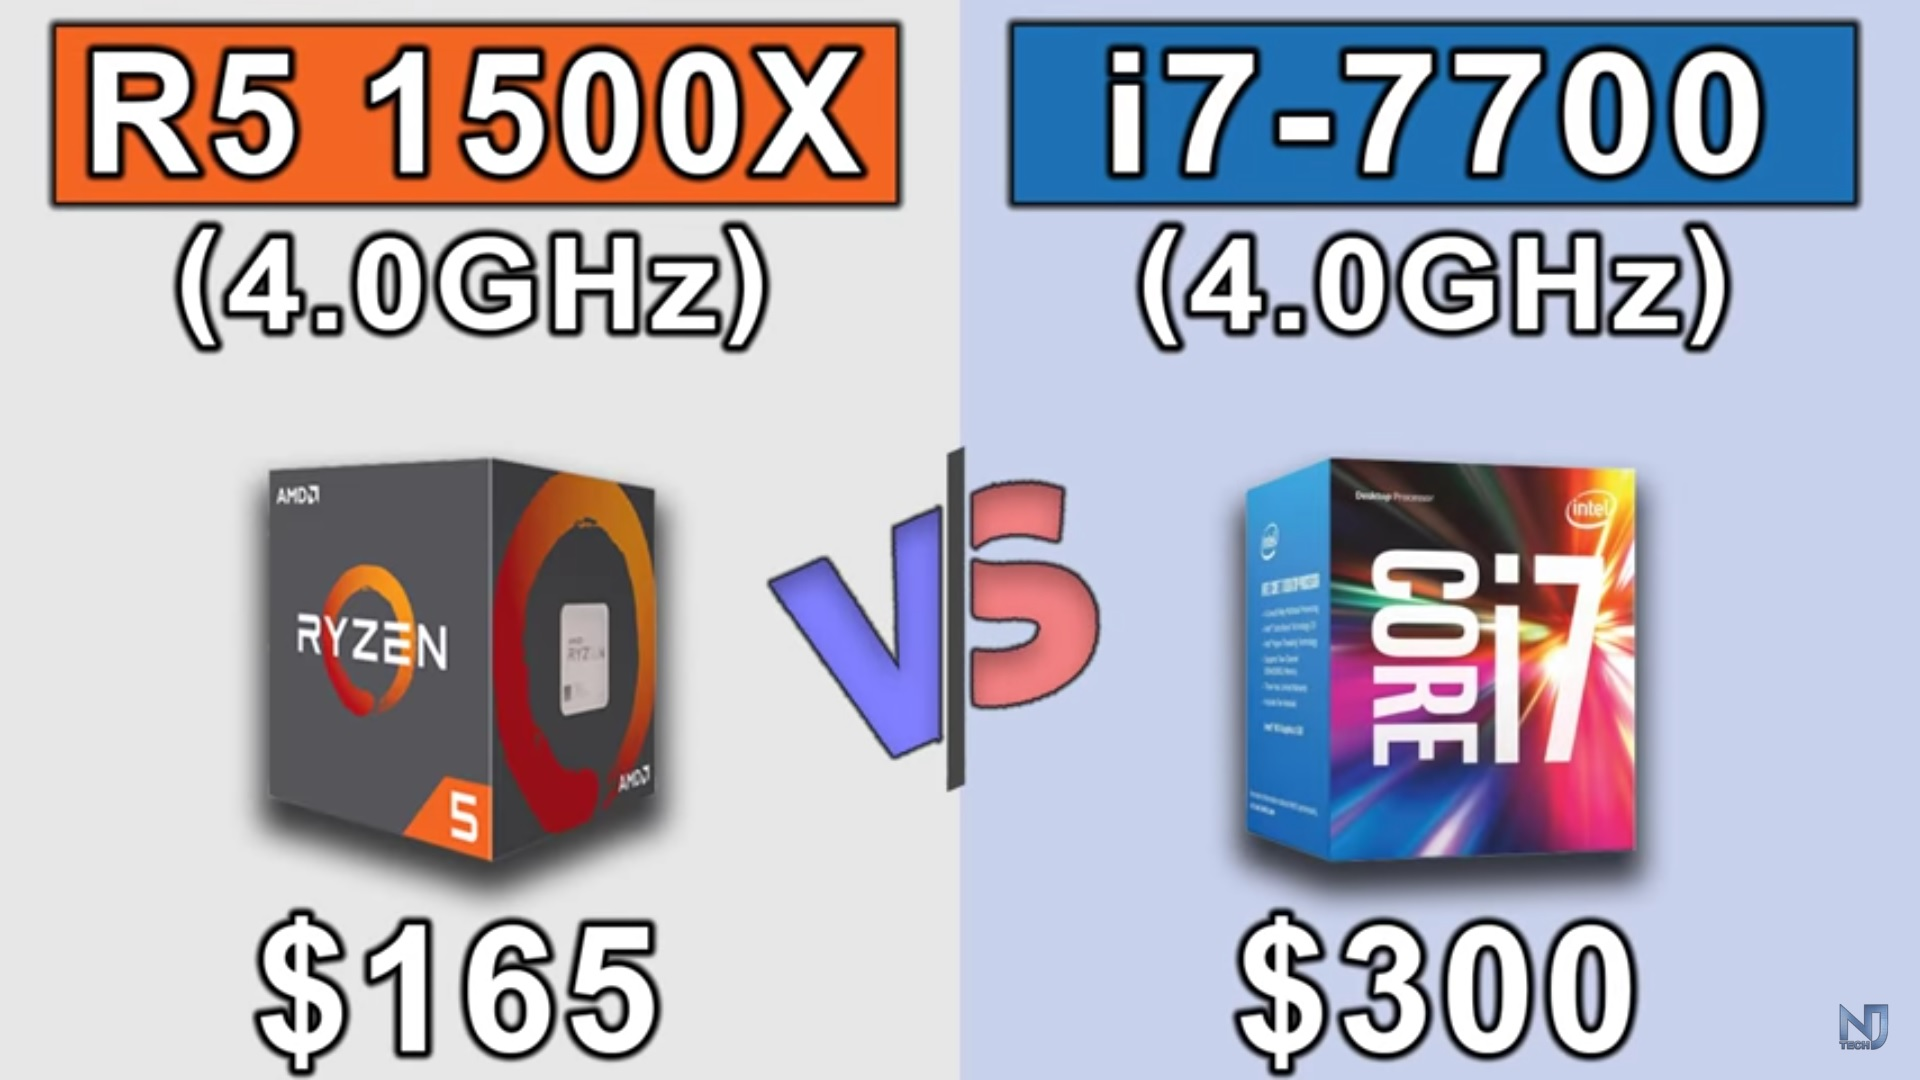 Ryzen 5 1500X vs Core i7 7700 con GeForce GTX 1080Ti